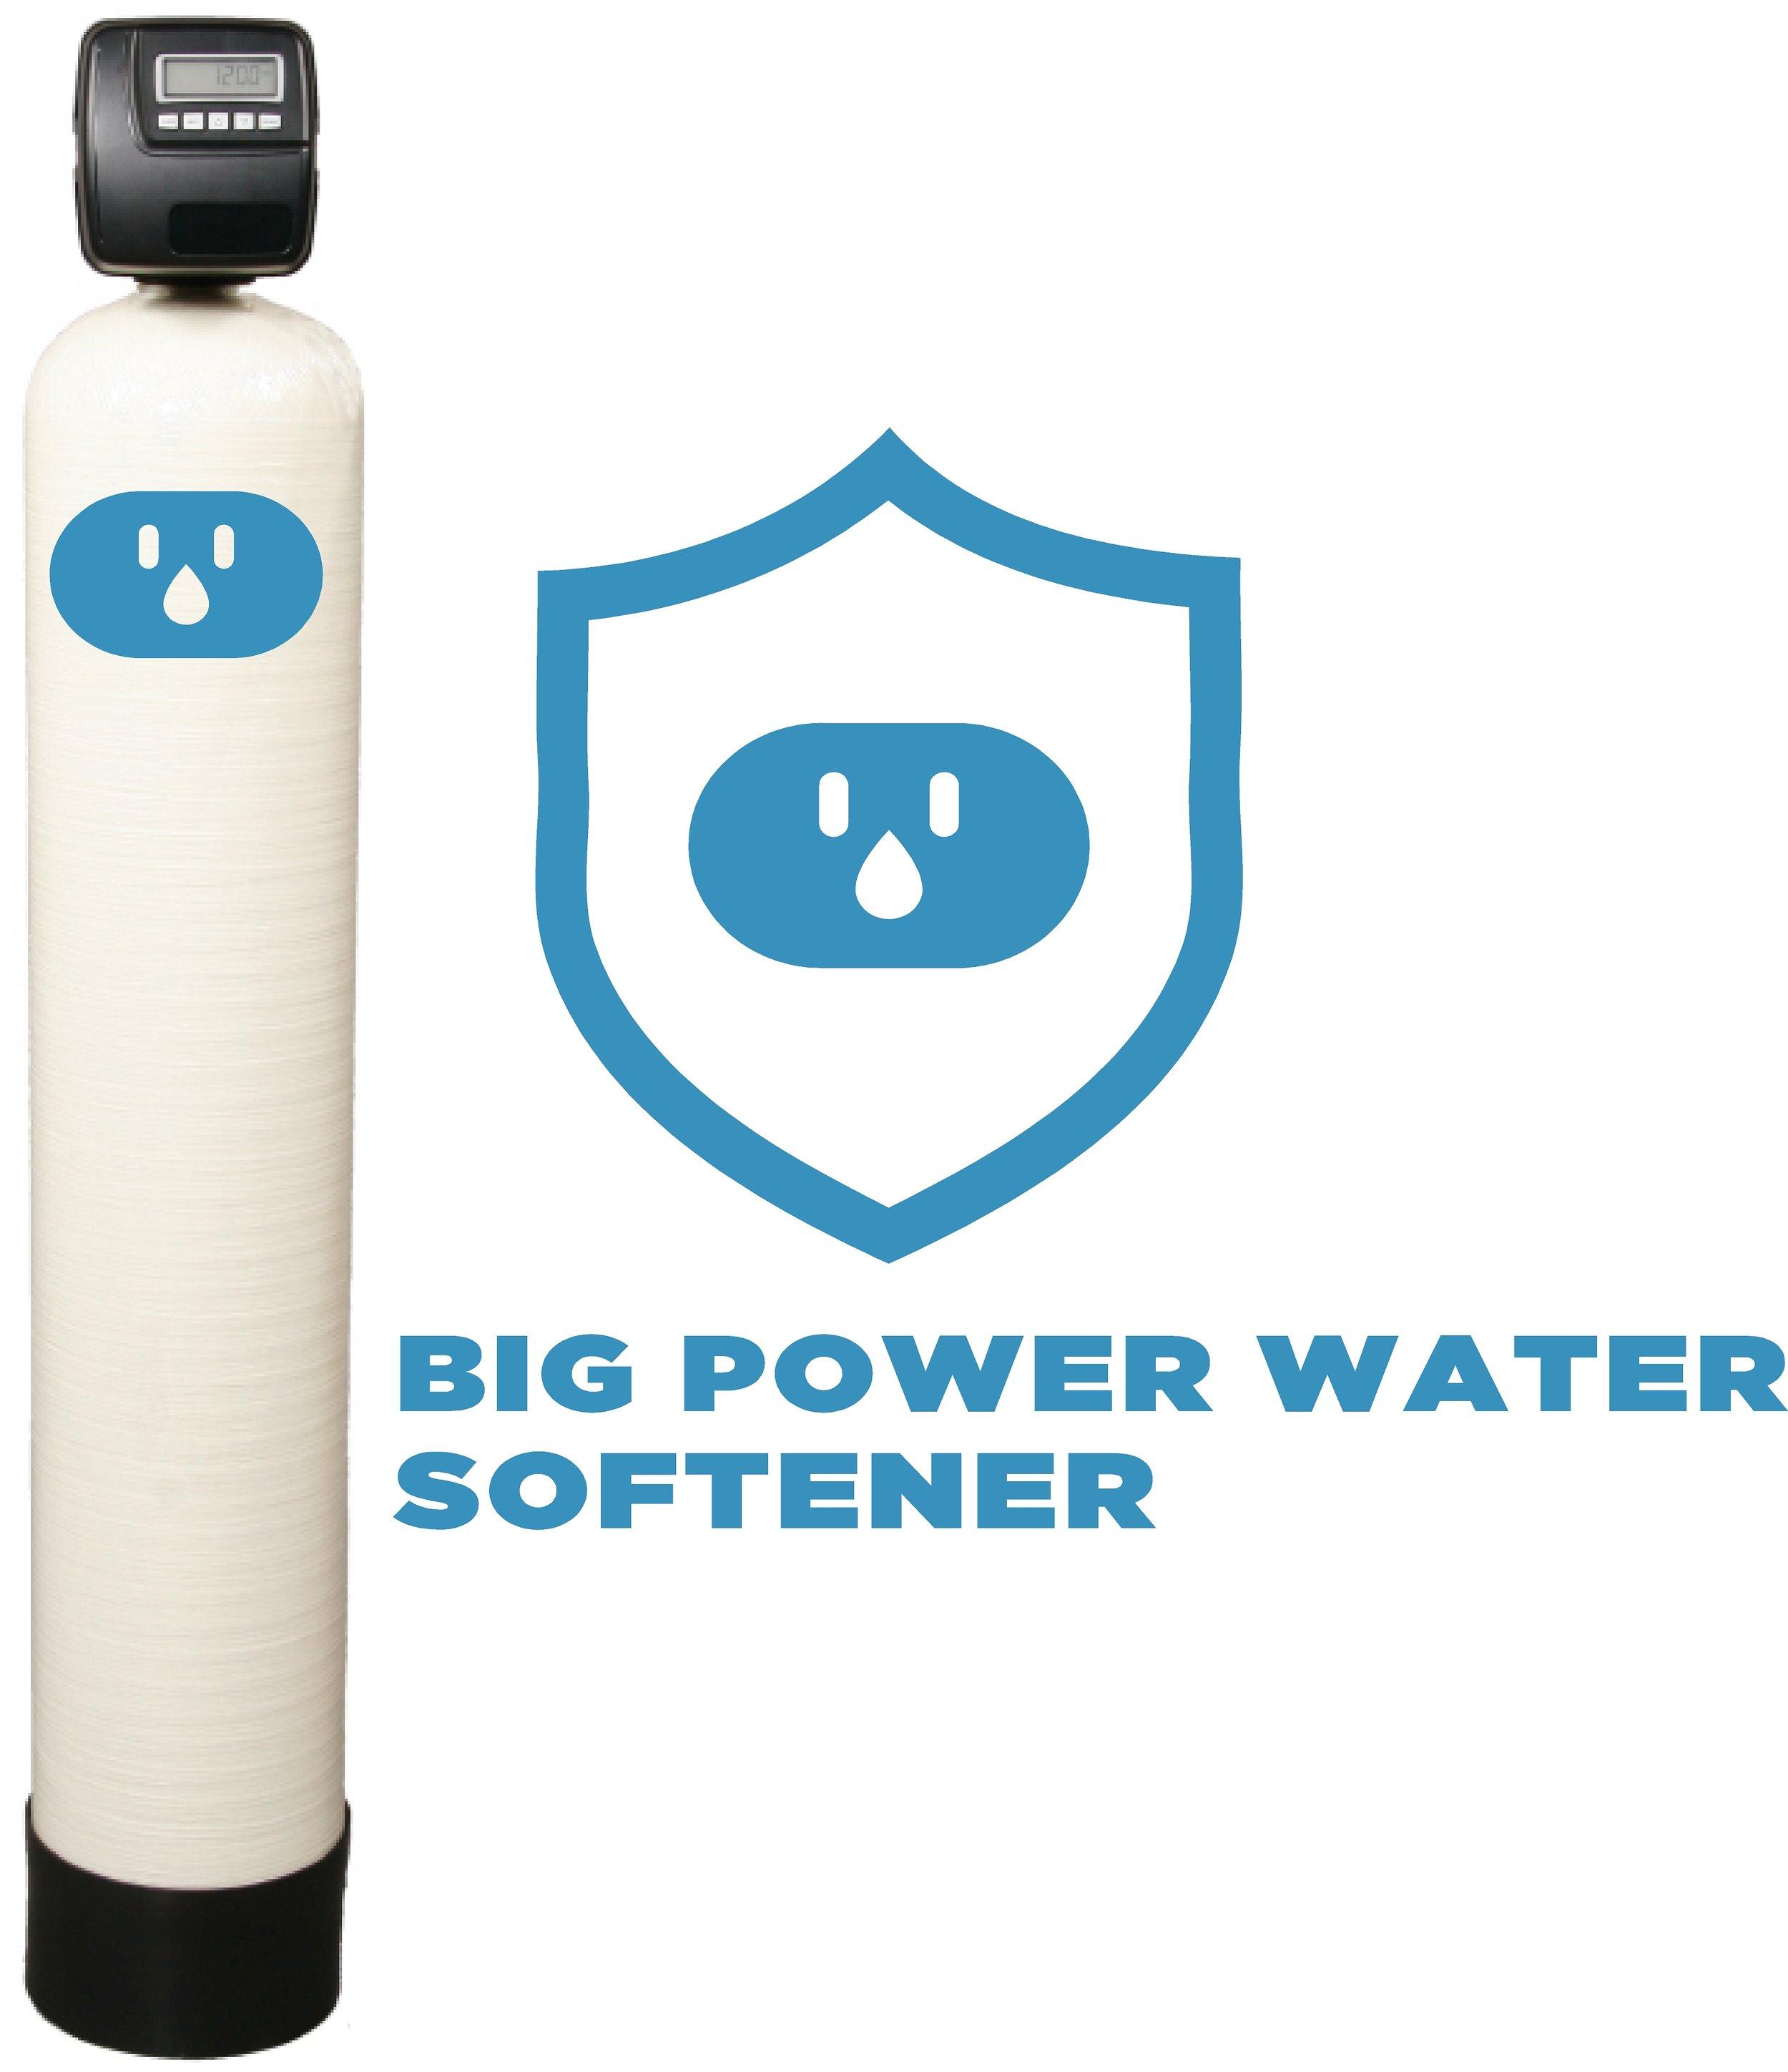 WATER SOFTENER BIG POWER WATER